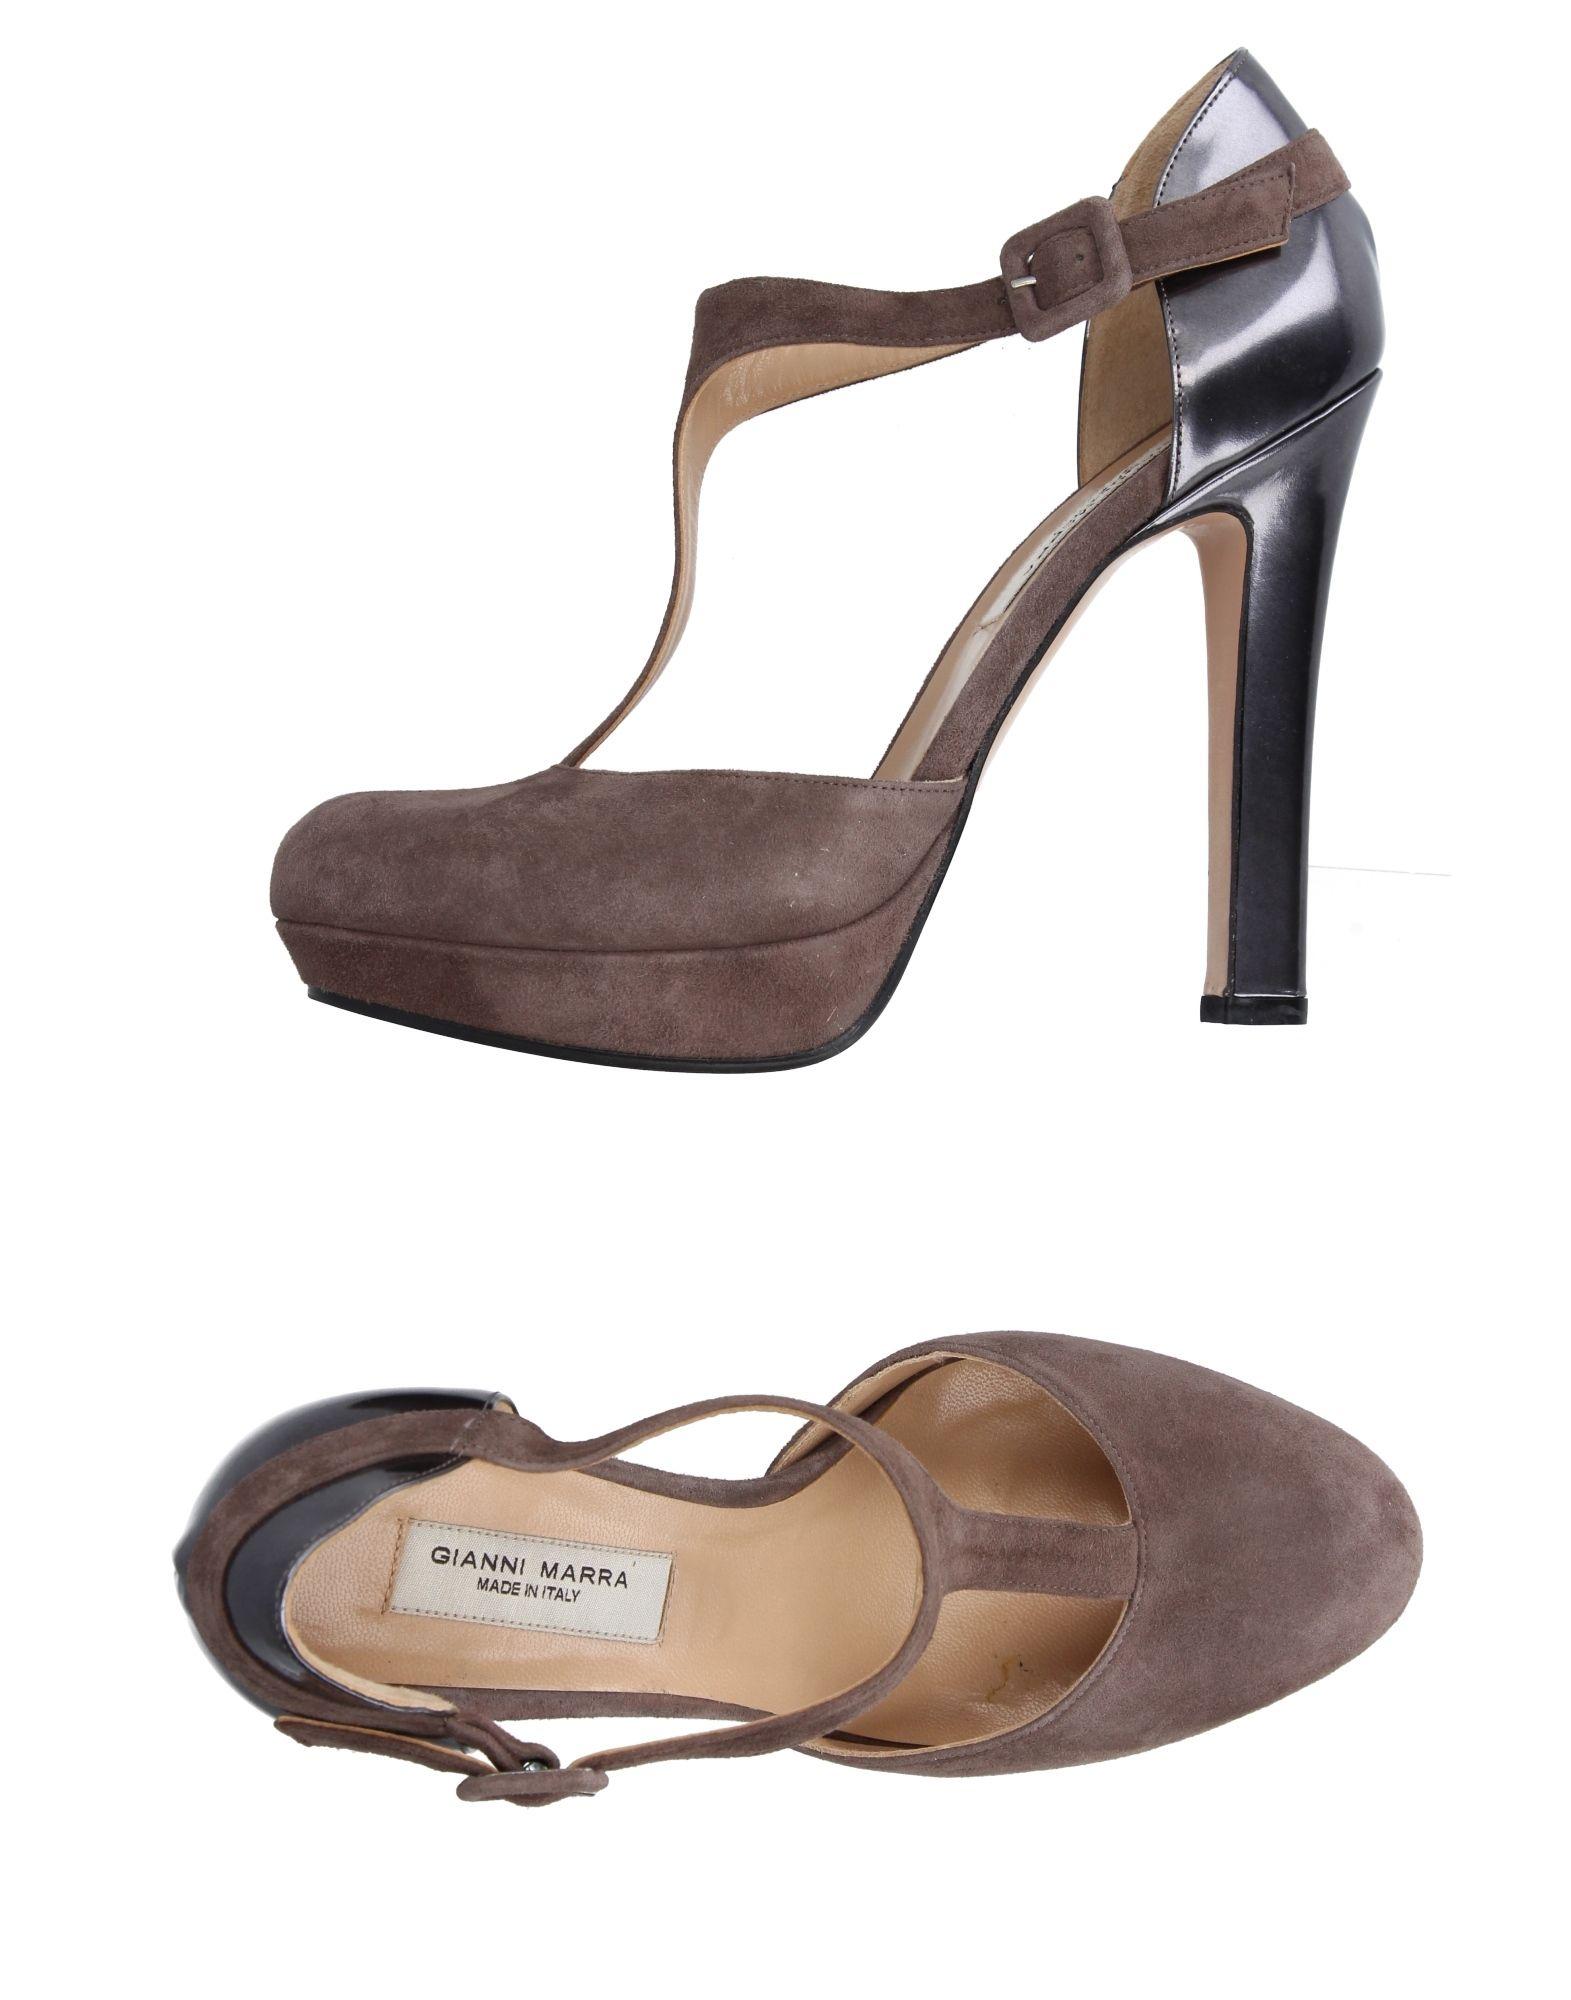 Stilvolle billige Schuhe Gianni Marra Pumps Damen  11230044NB